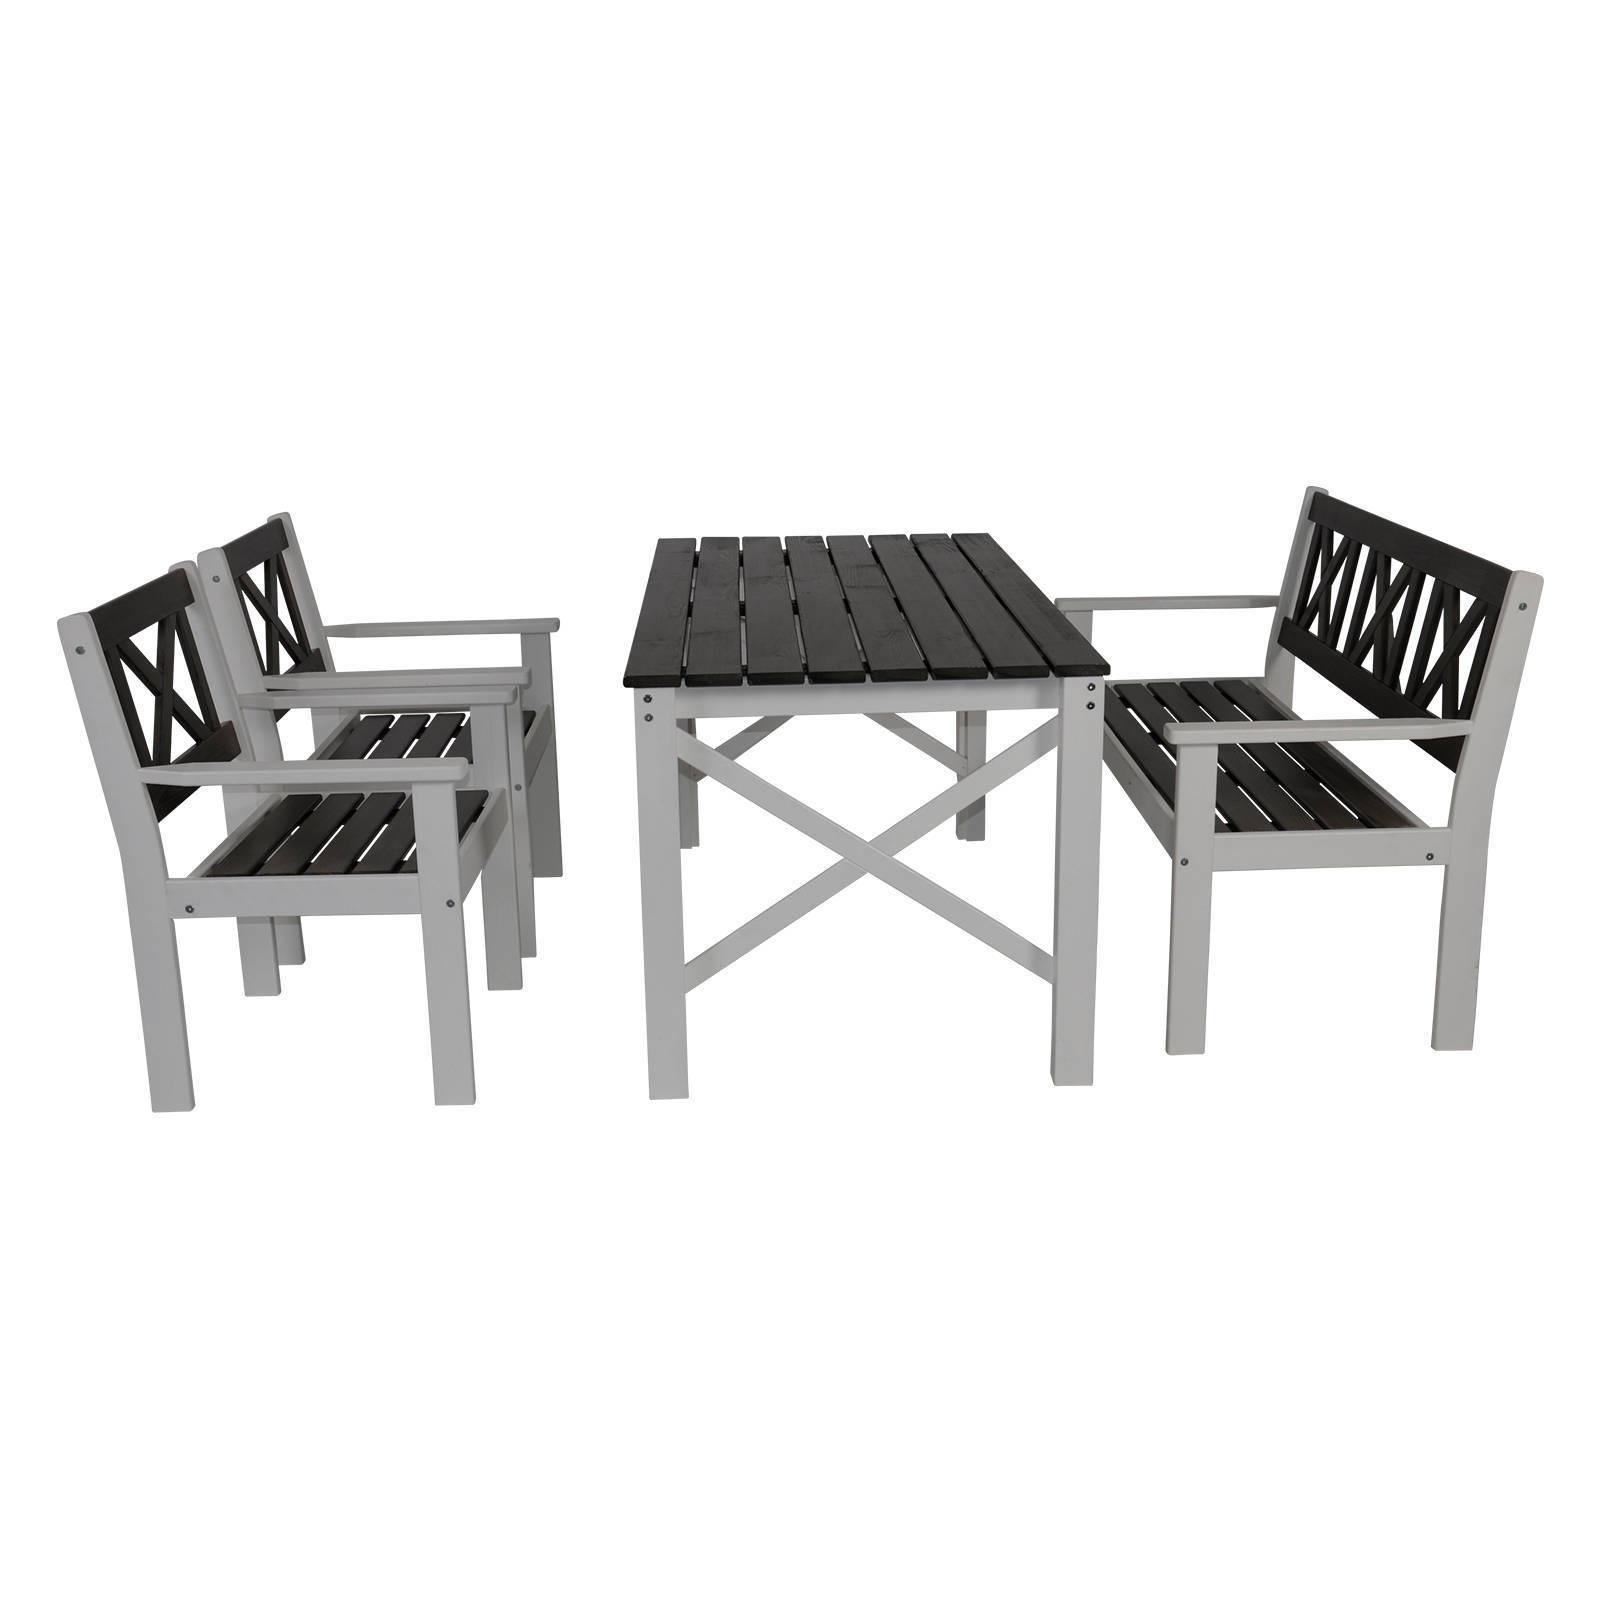 Tapa Holzmöbel Gartenmöbel Set Aus Kiefernholz 4tlg Grau Weiß